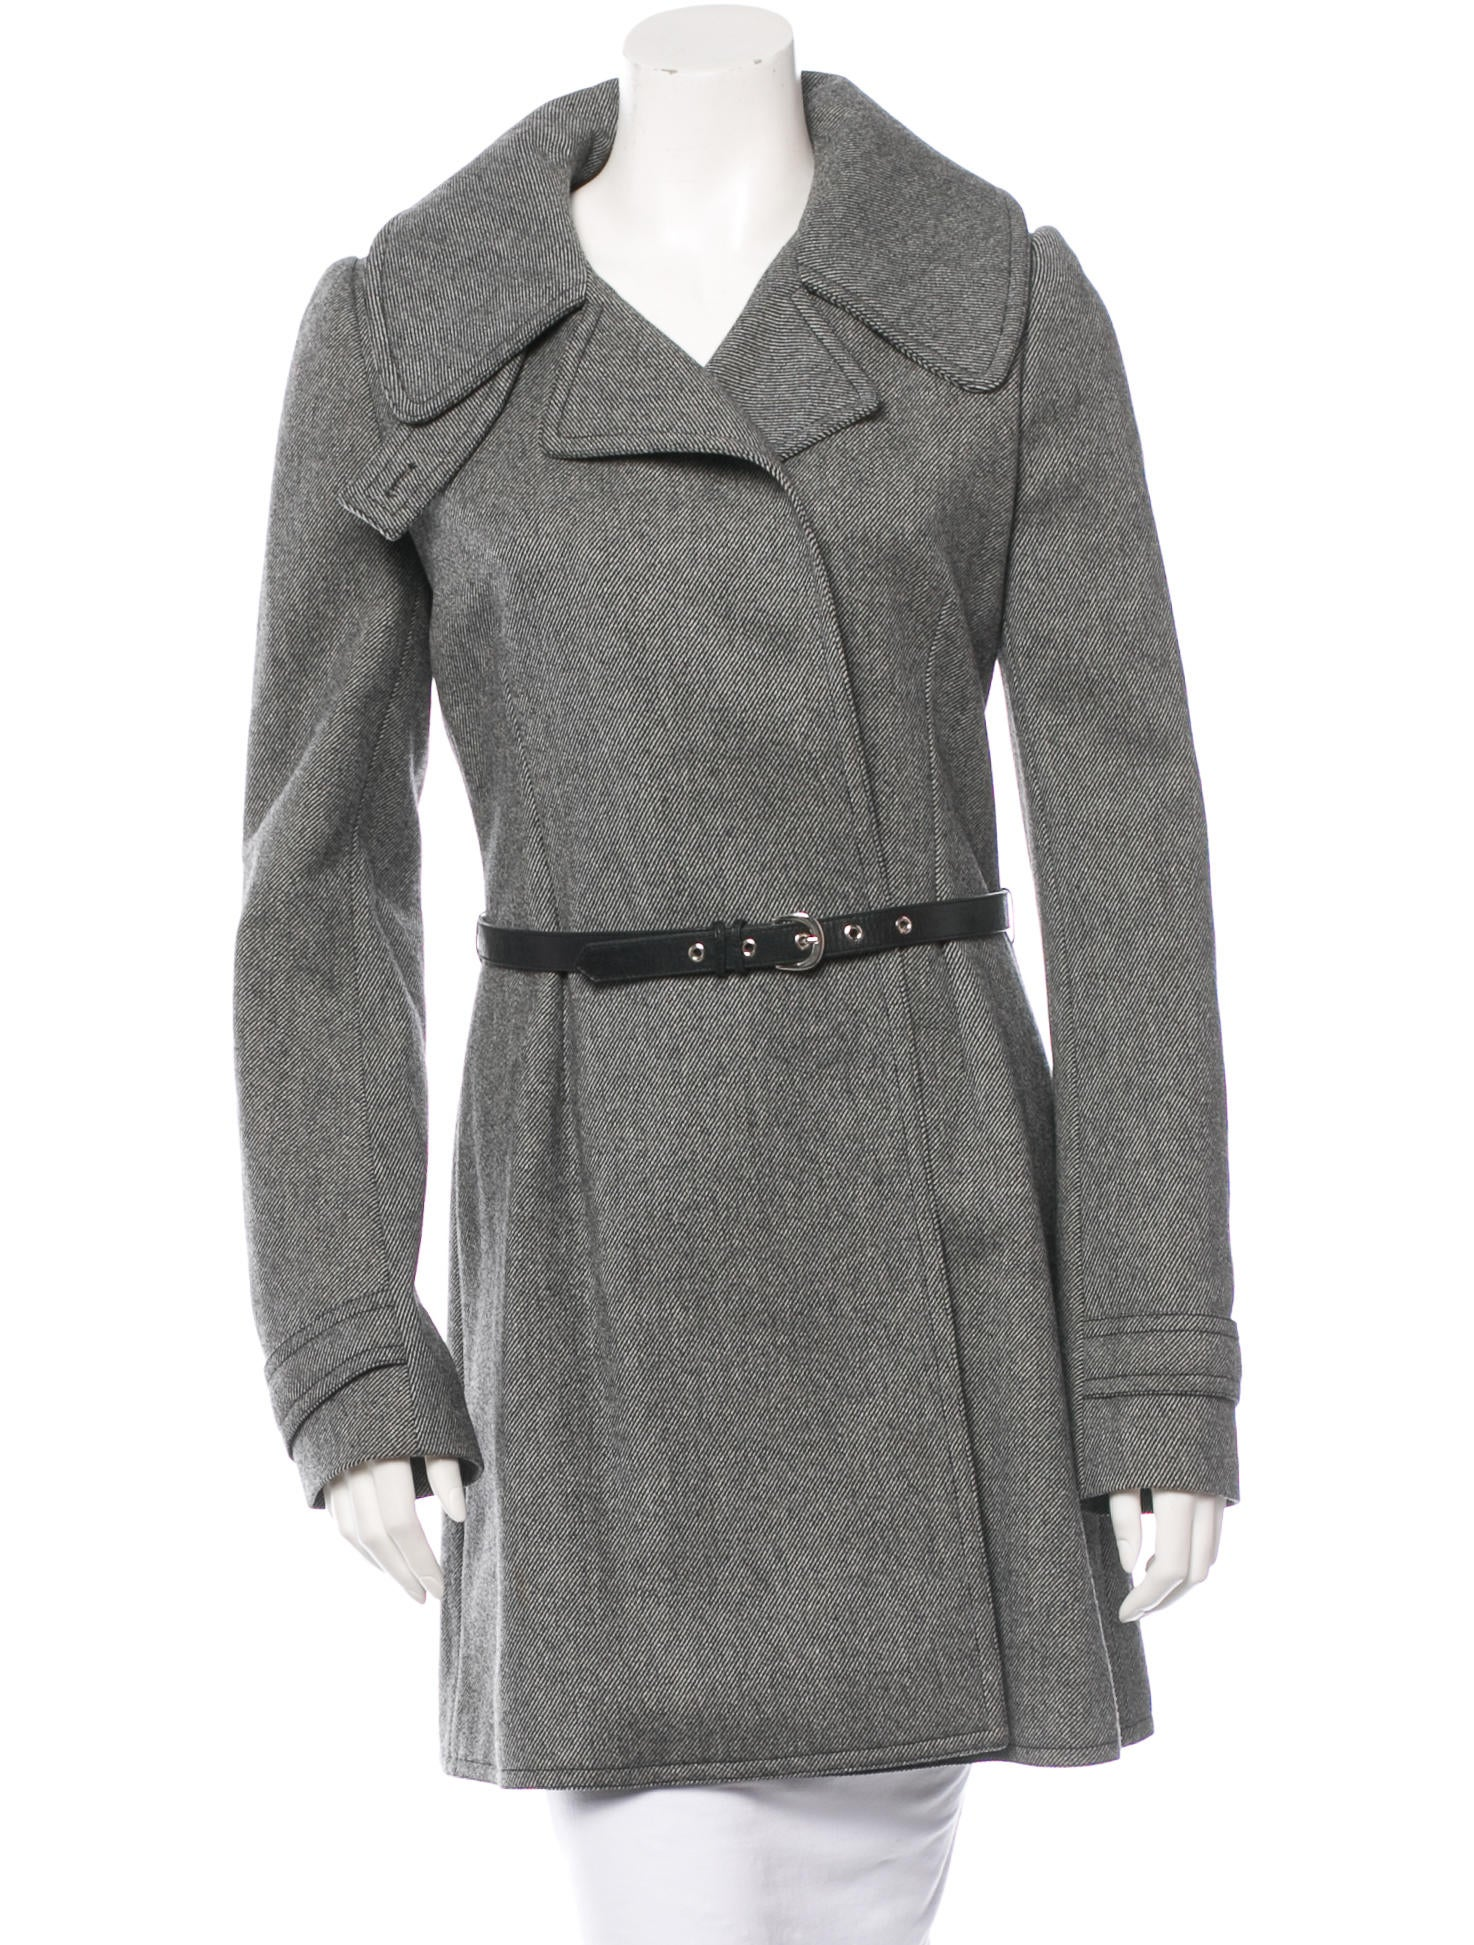 8ba520fd86c6 Balenciaga Women s Wool Coat Apricot